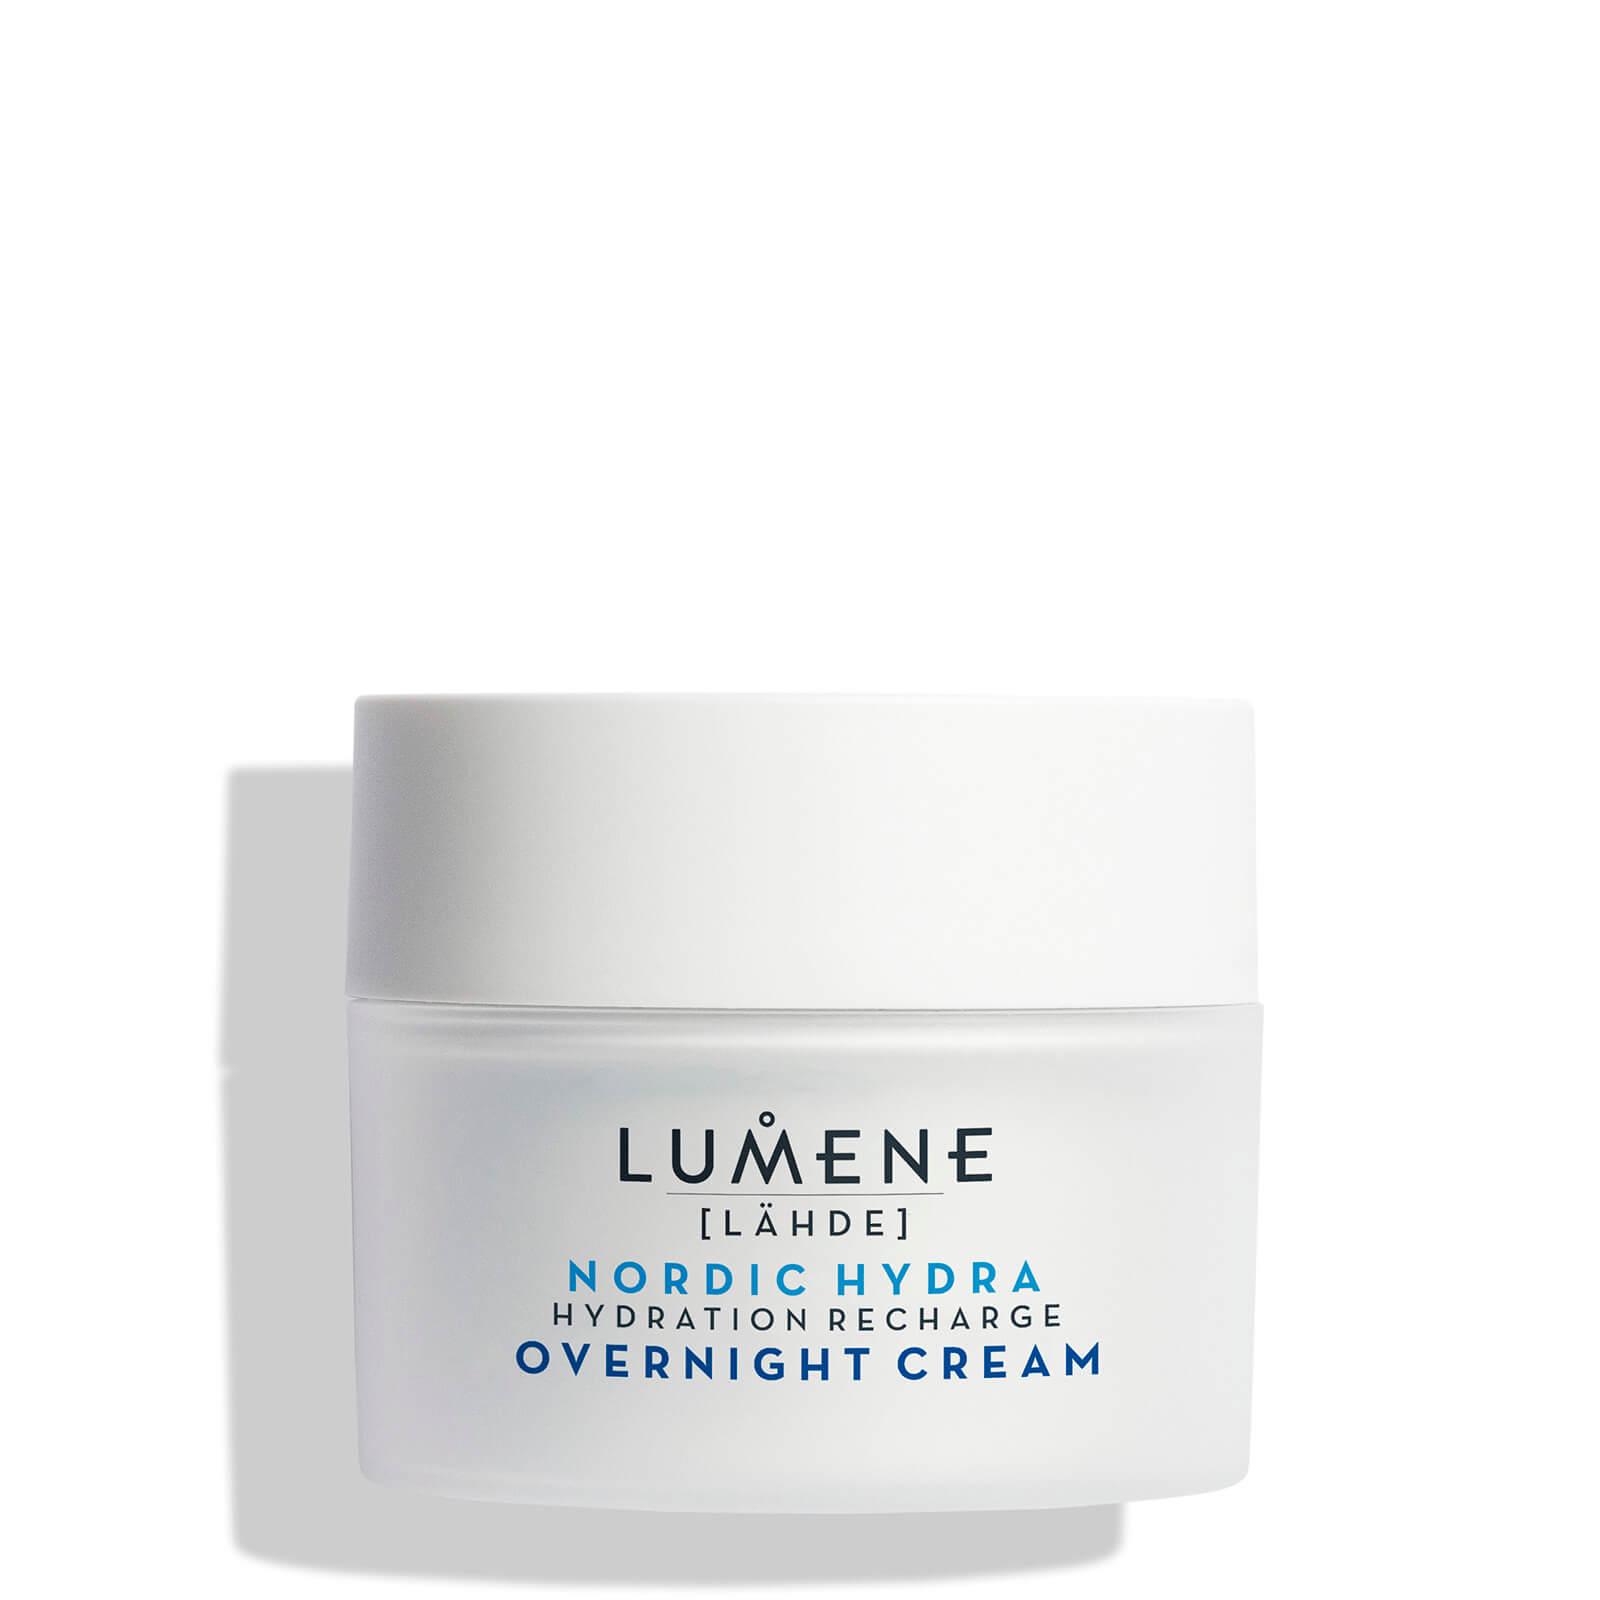 Купить Ночной увлажняющий восстанавливающий крем Lumene Nordic Hydra [Lähde] Hydration Recharge Overnight Cream 50 мл